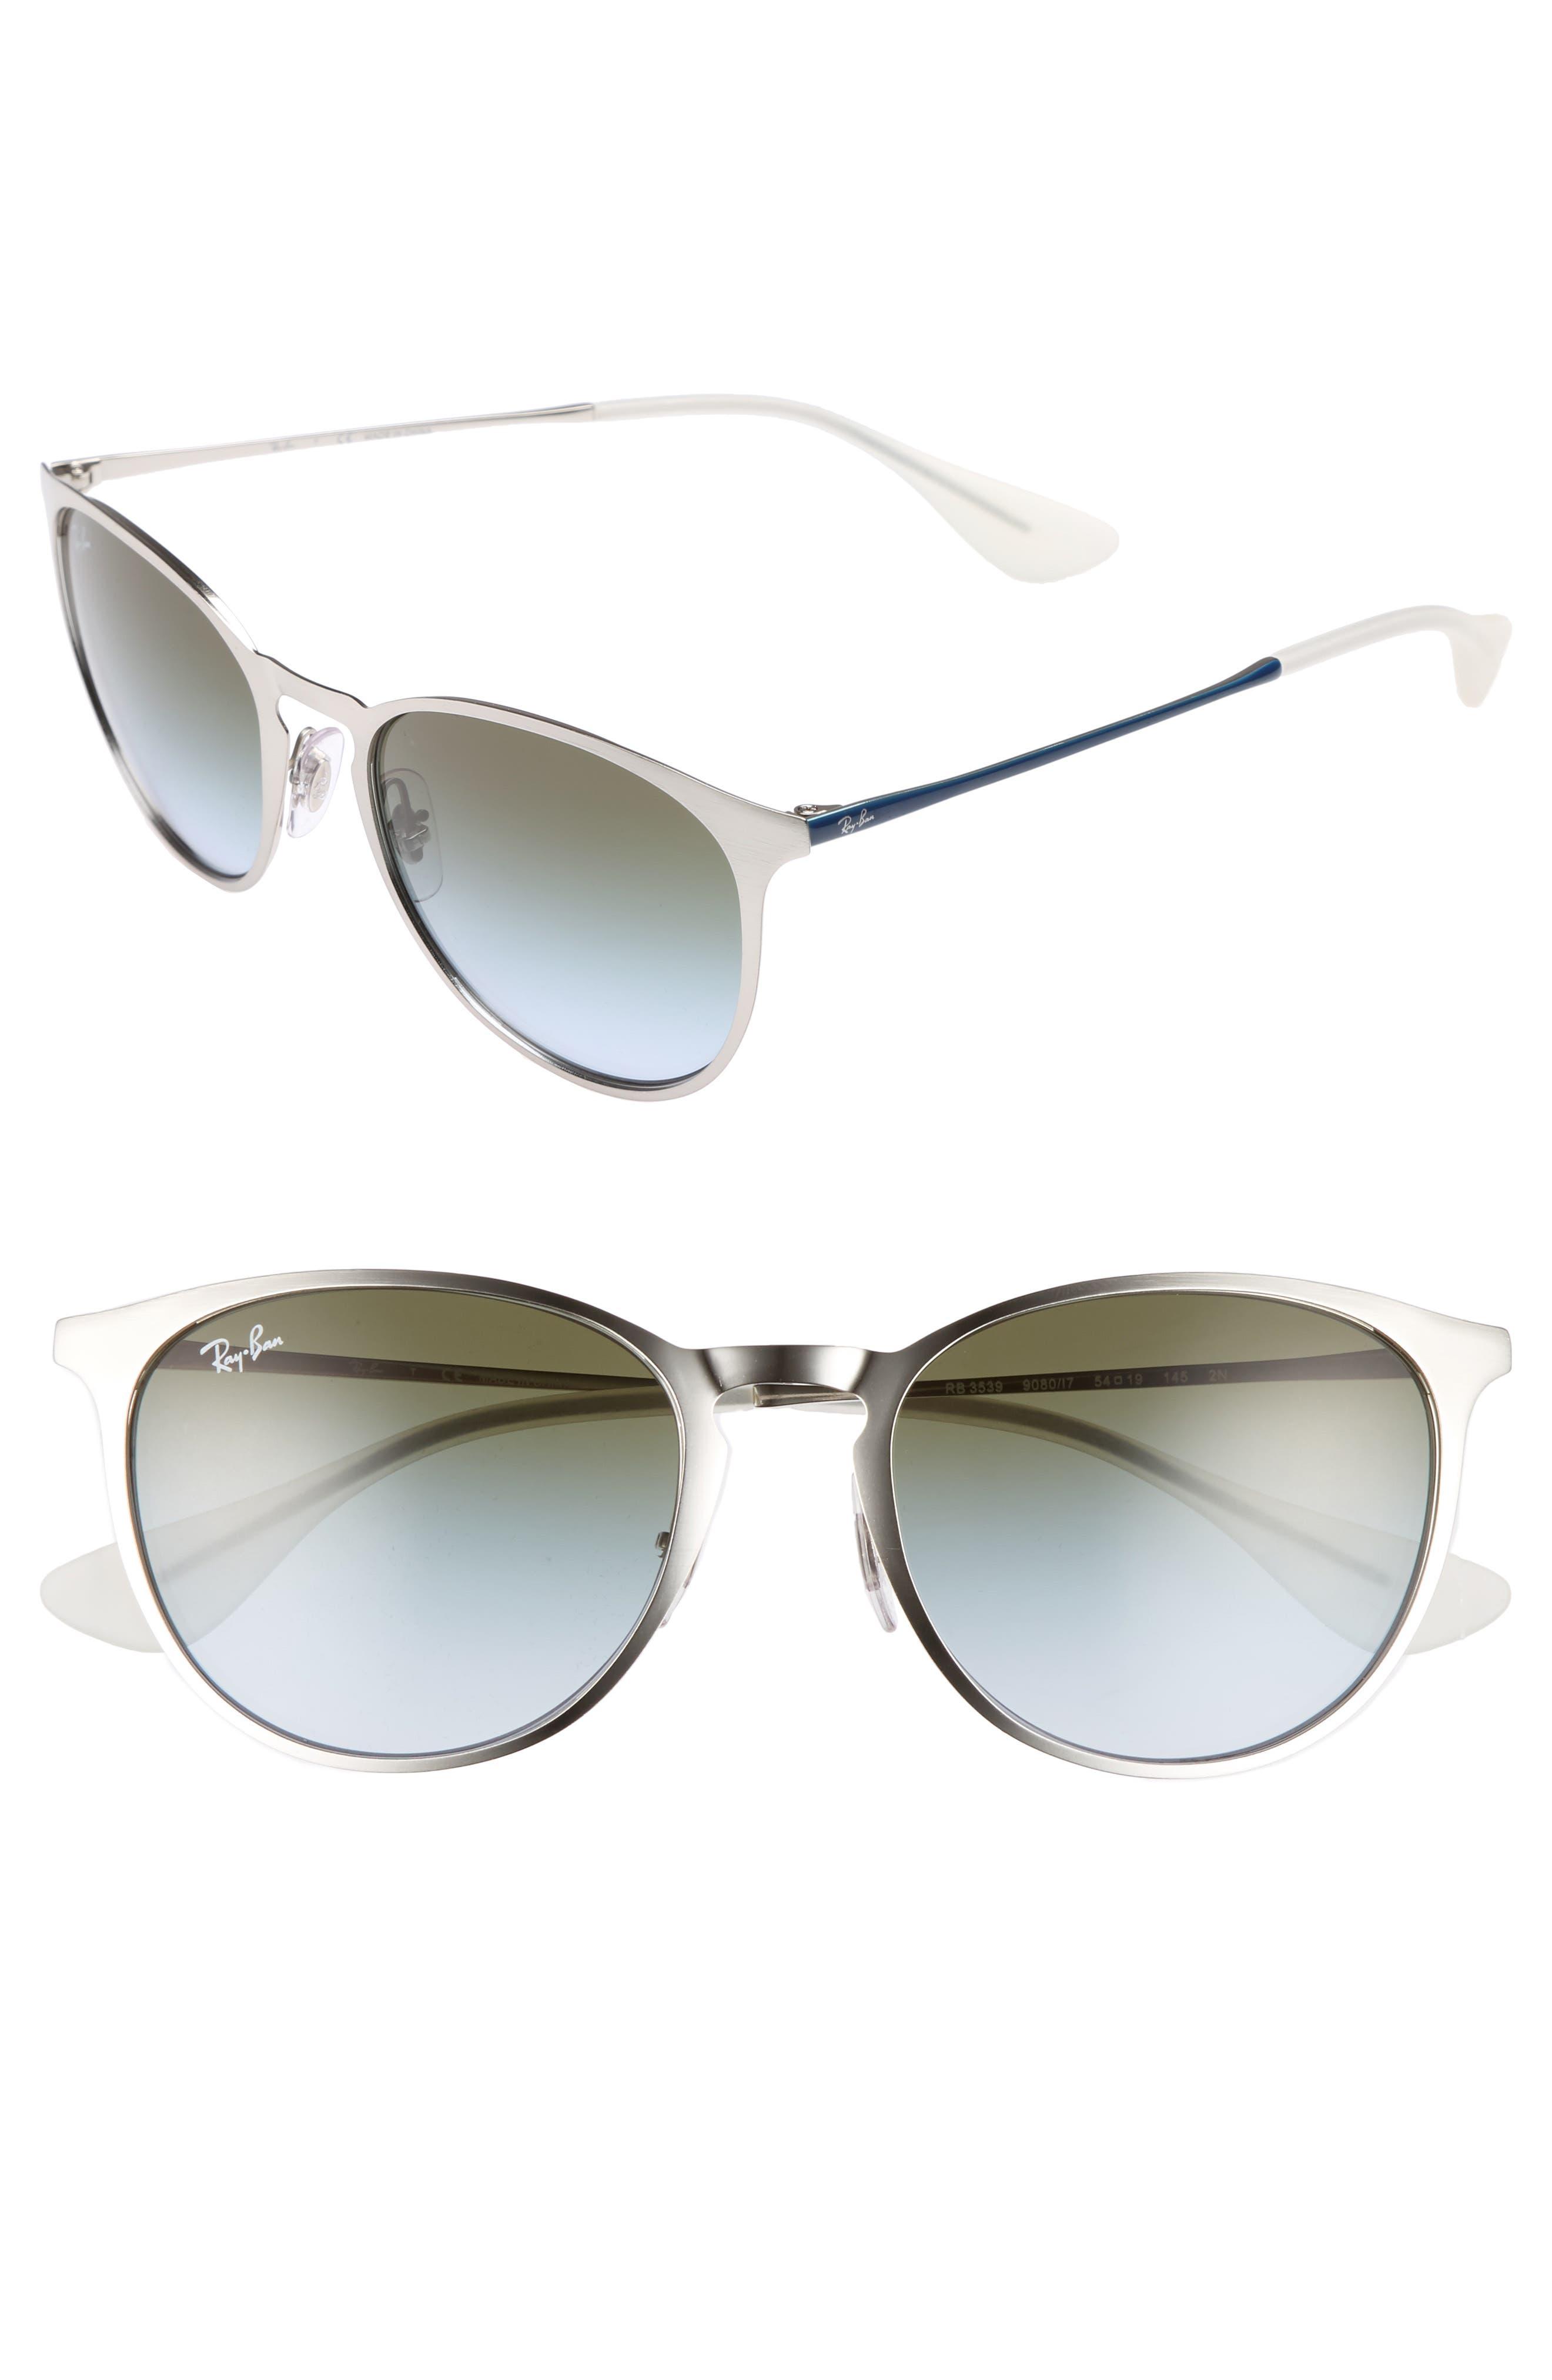 Ray-Ban Erika 5m Metal Sunglasses - Silver/ Blue